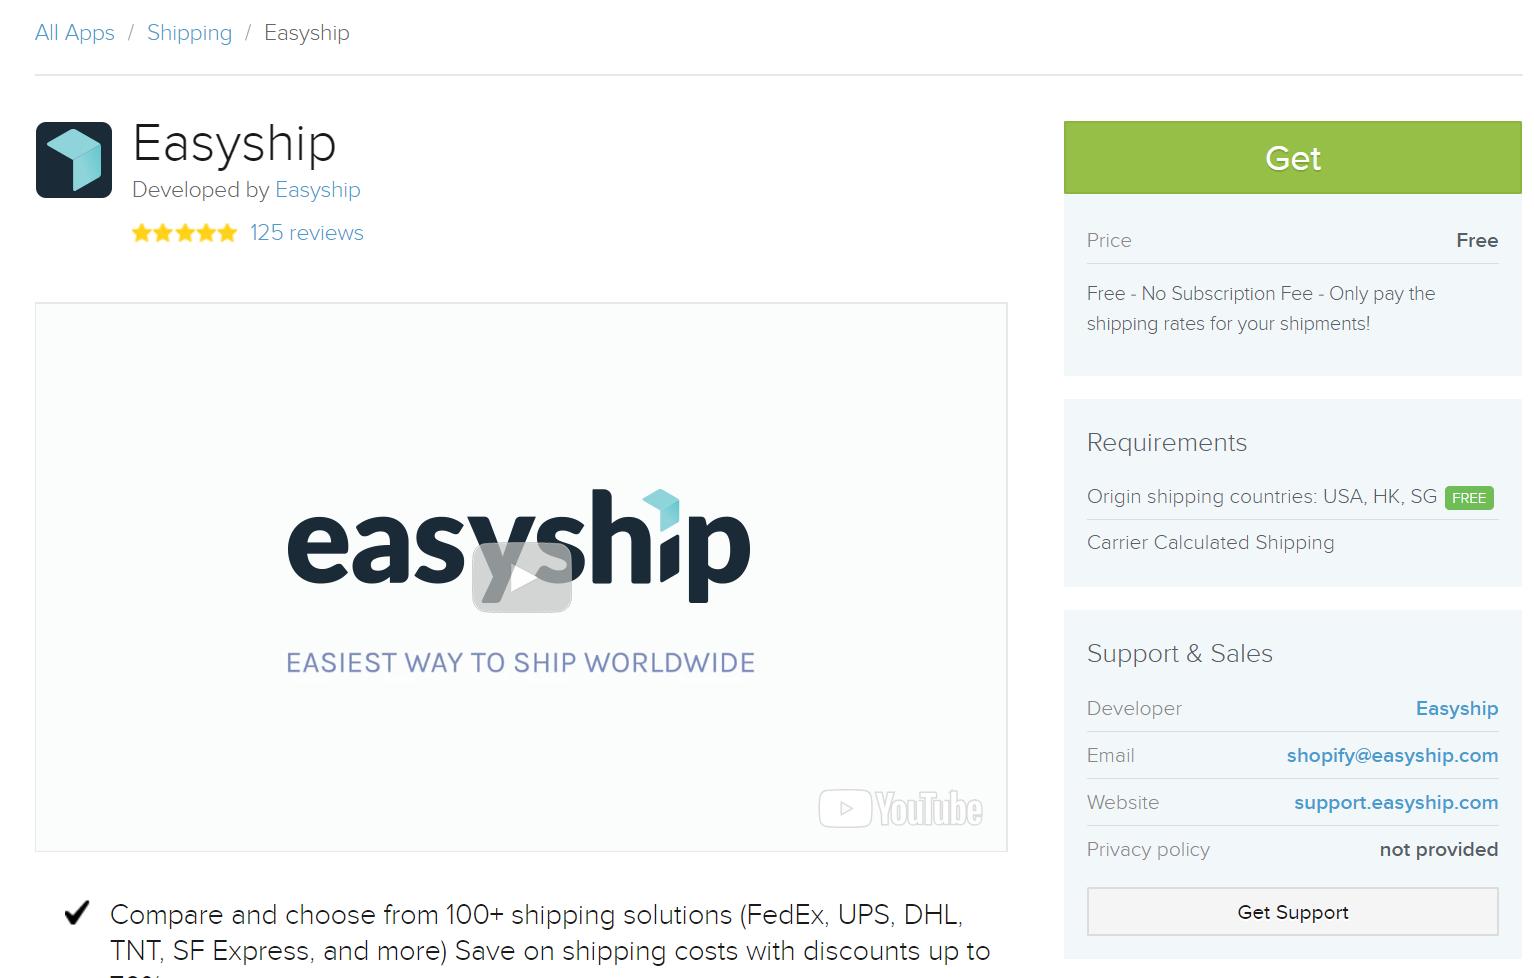 Easyship app in Shopify App Store